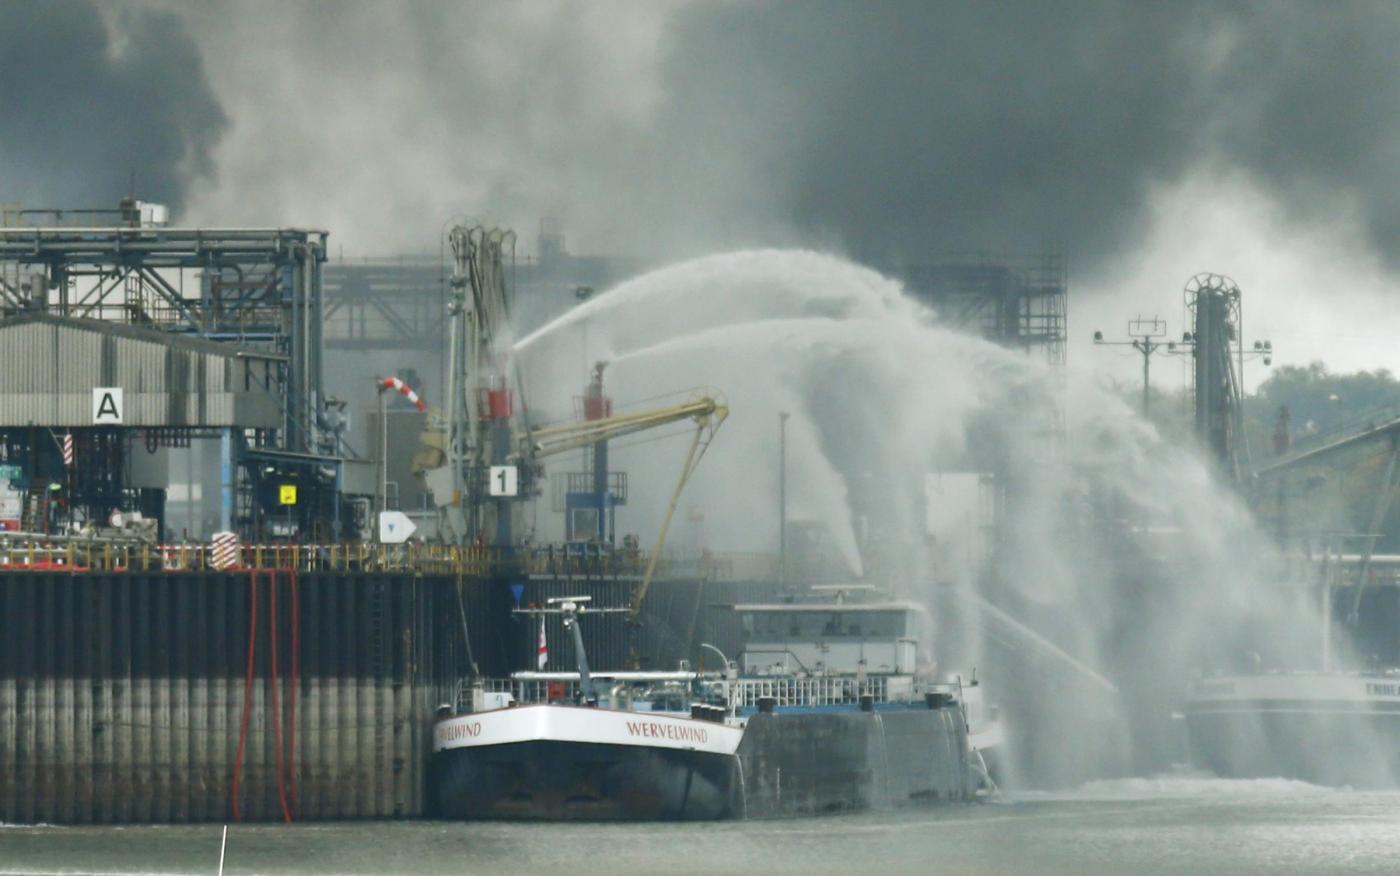 Germania, esplosione in due impianti chimici a Ludwigshafen